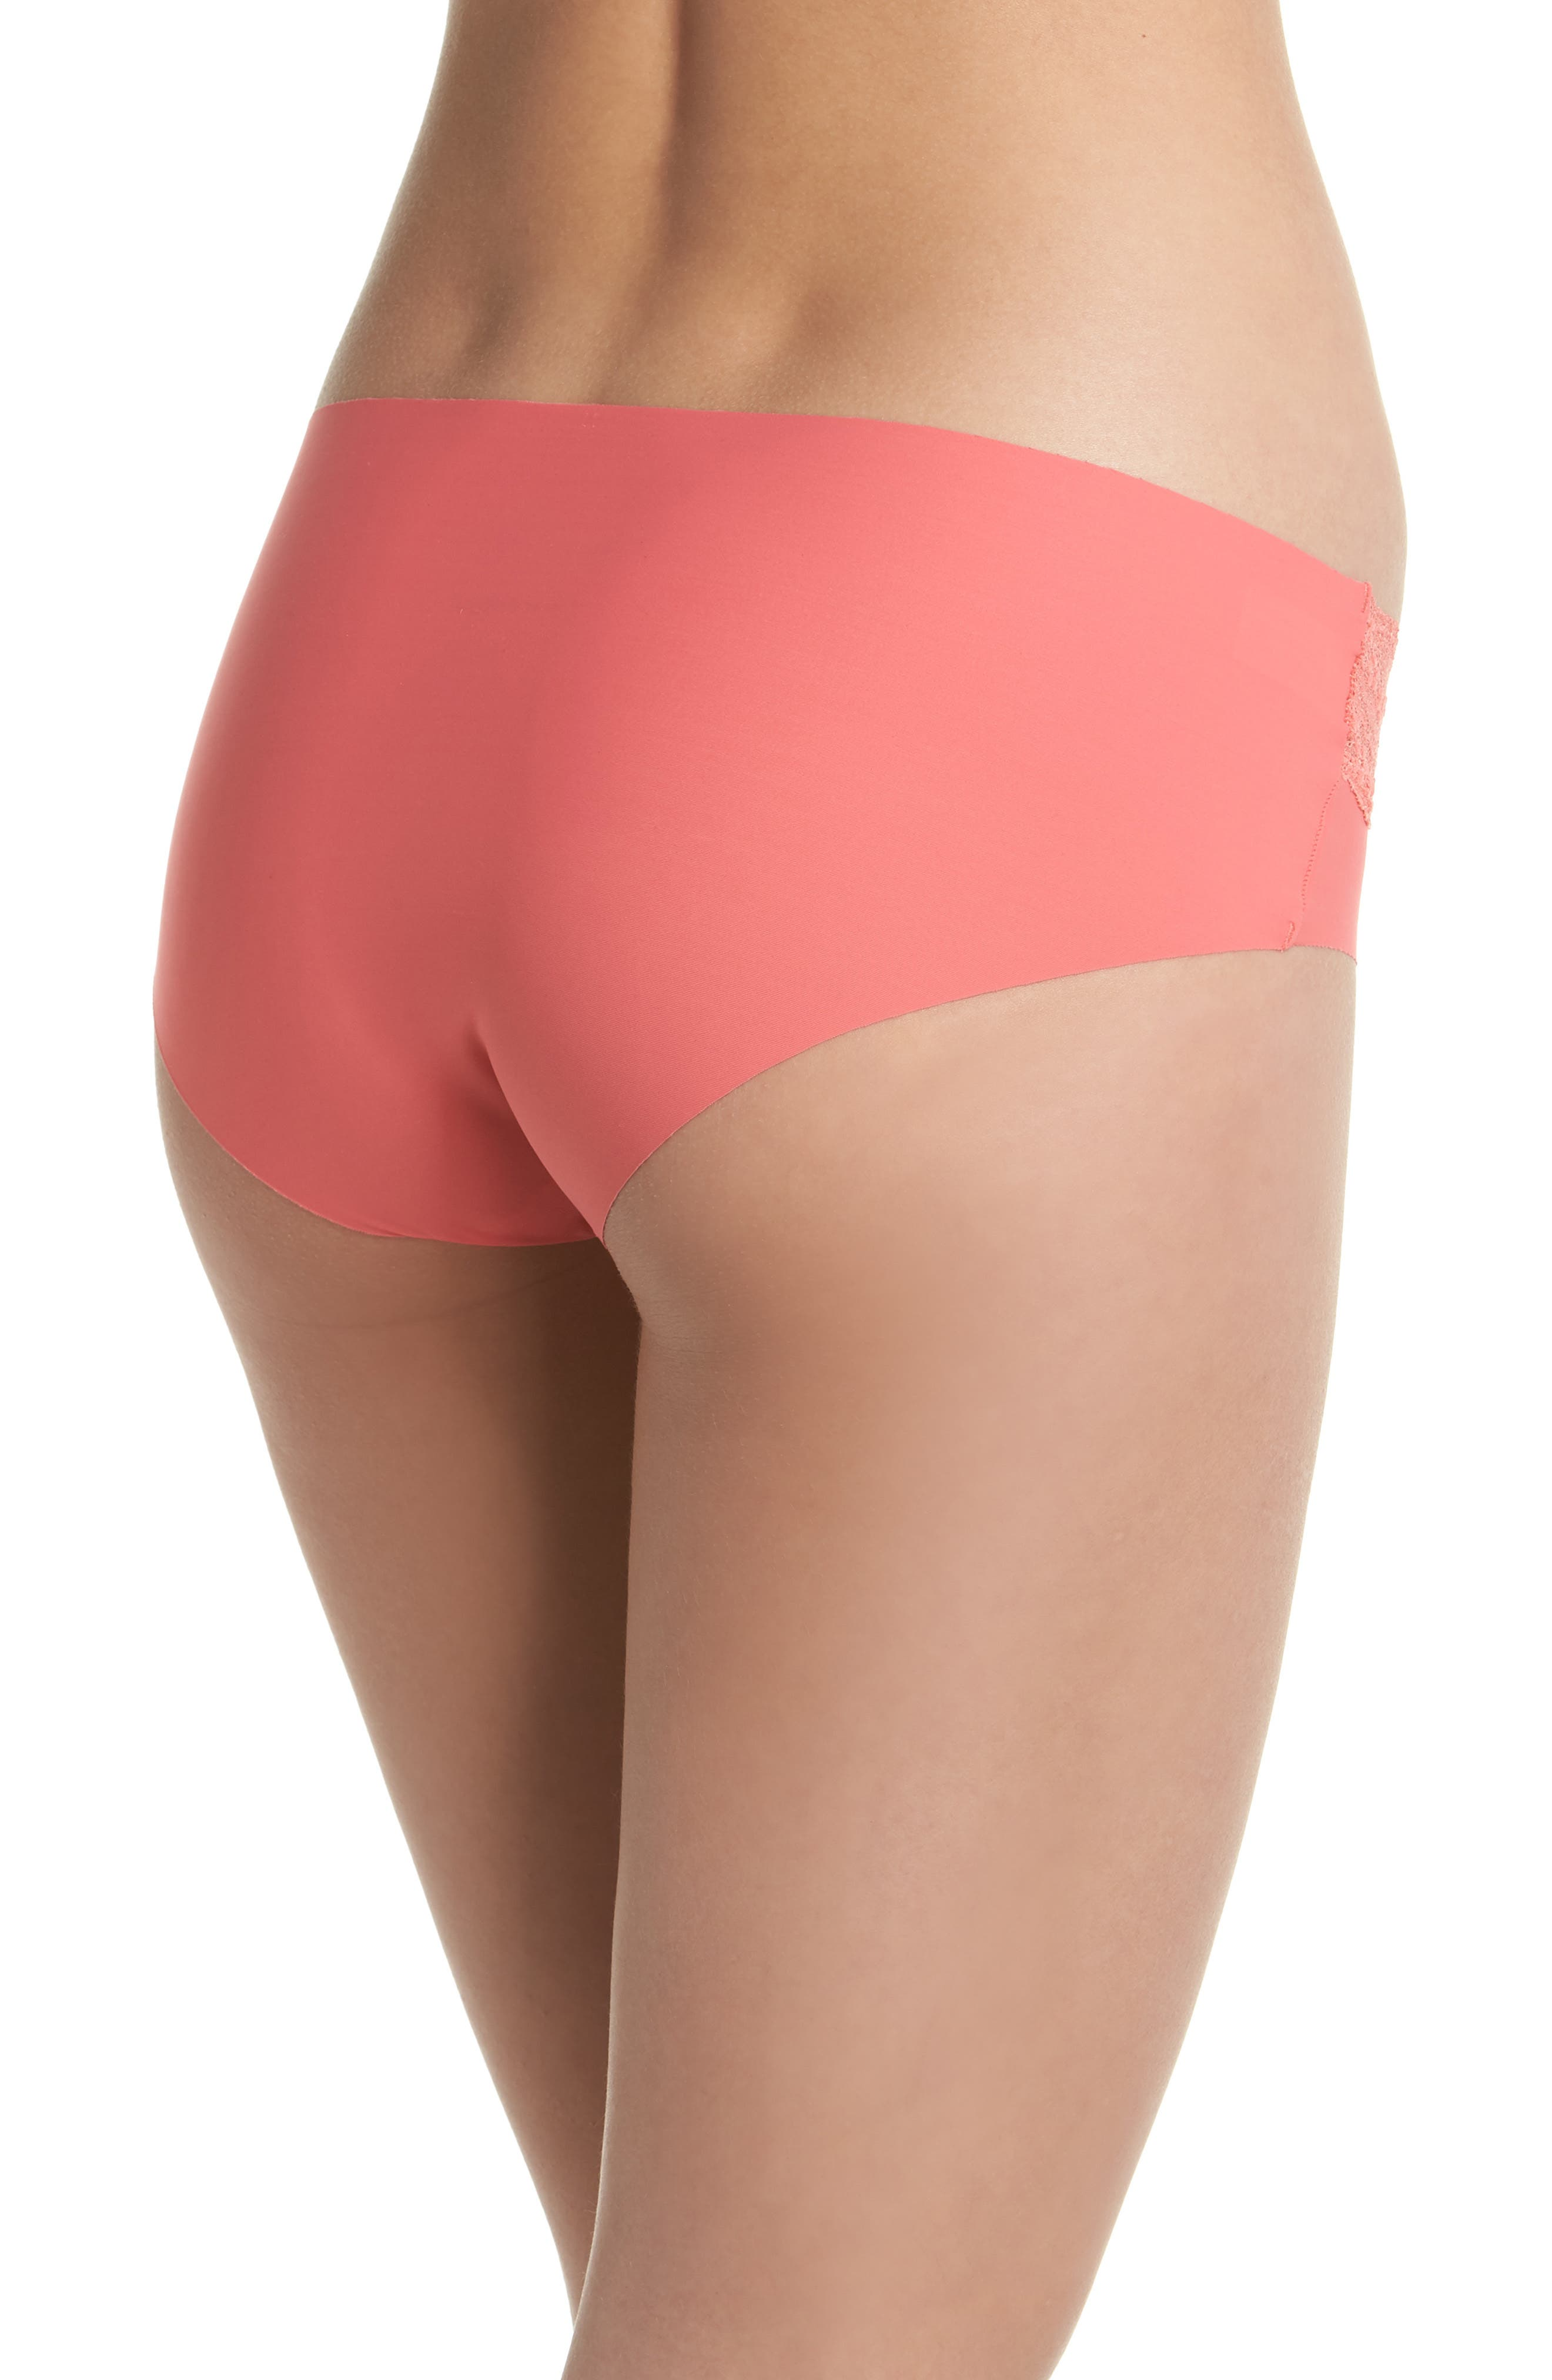 b.bare Hipster Panties,                             Alternate thumbnail 2, color,                             Calypso Coral